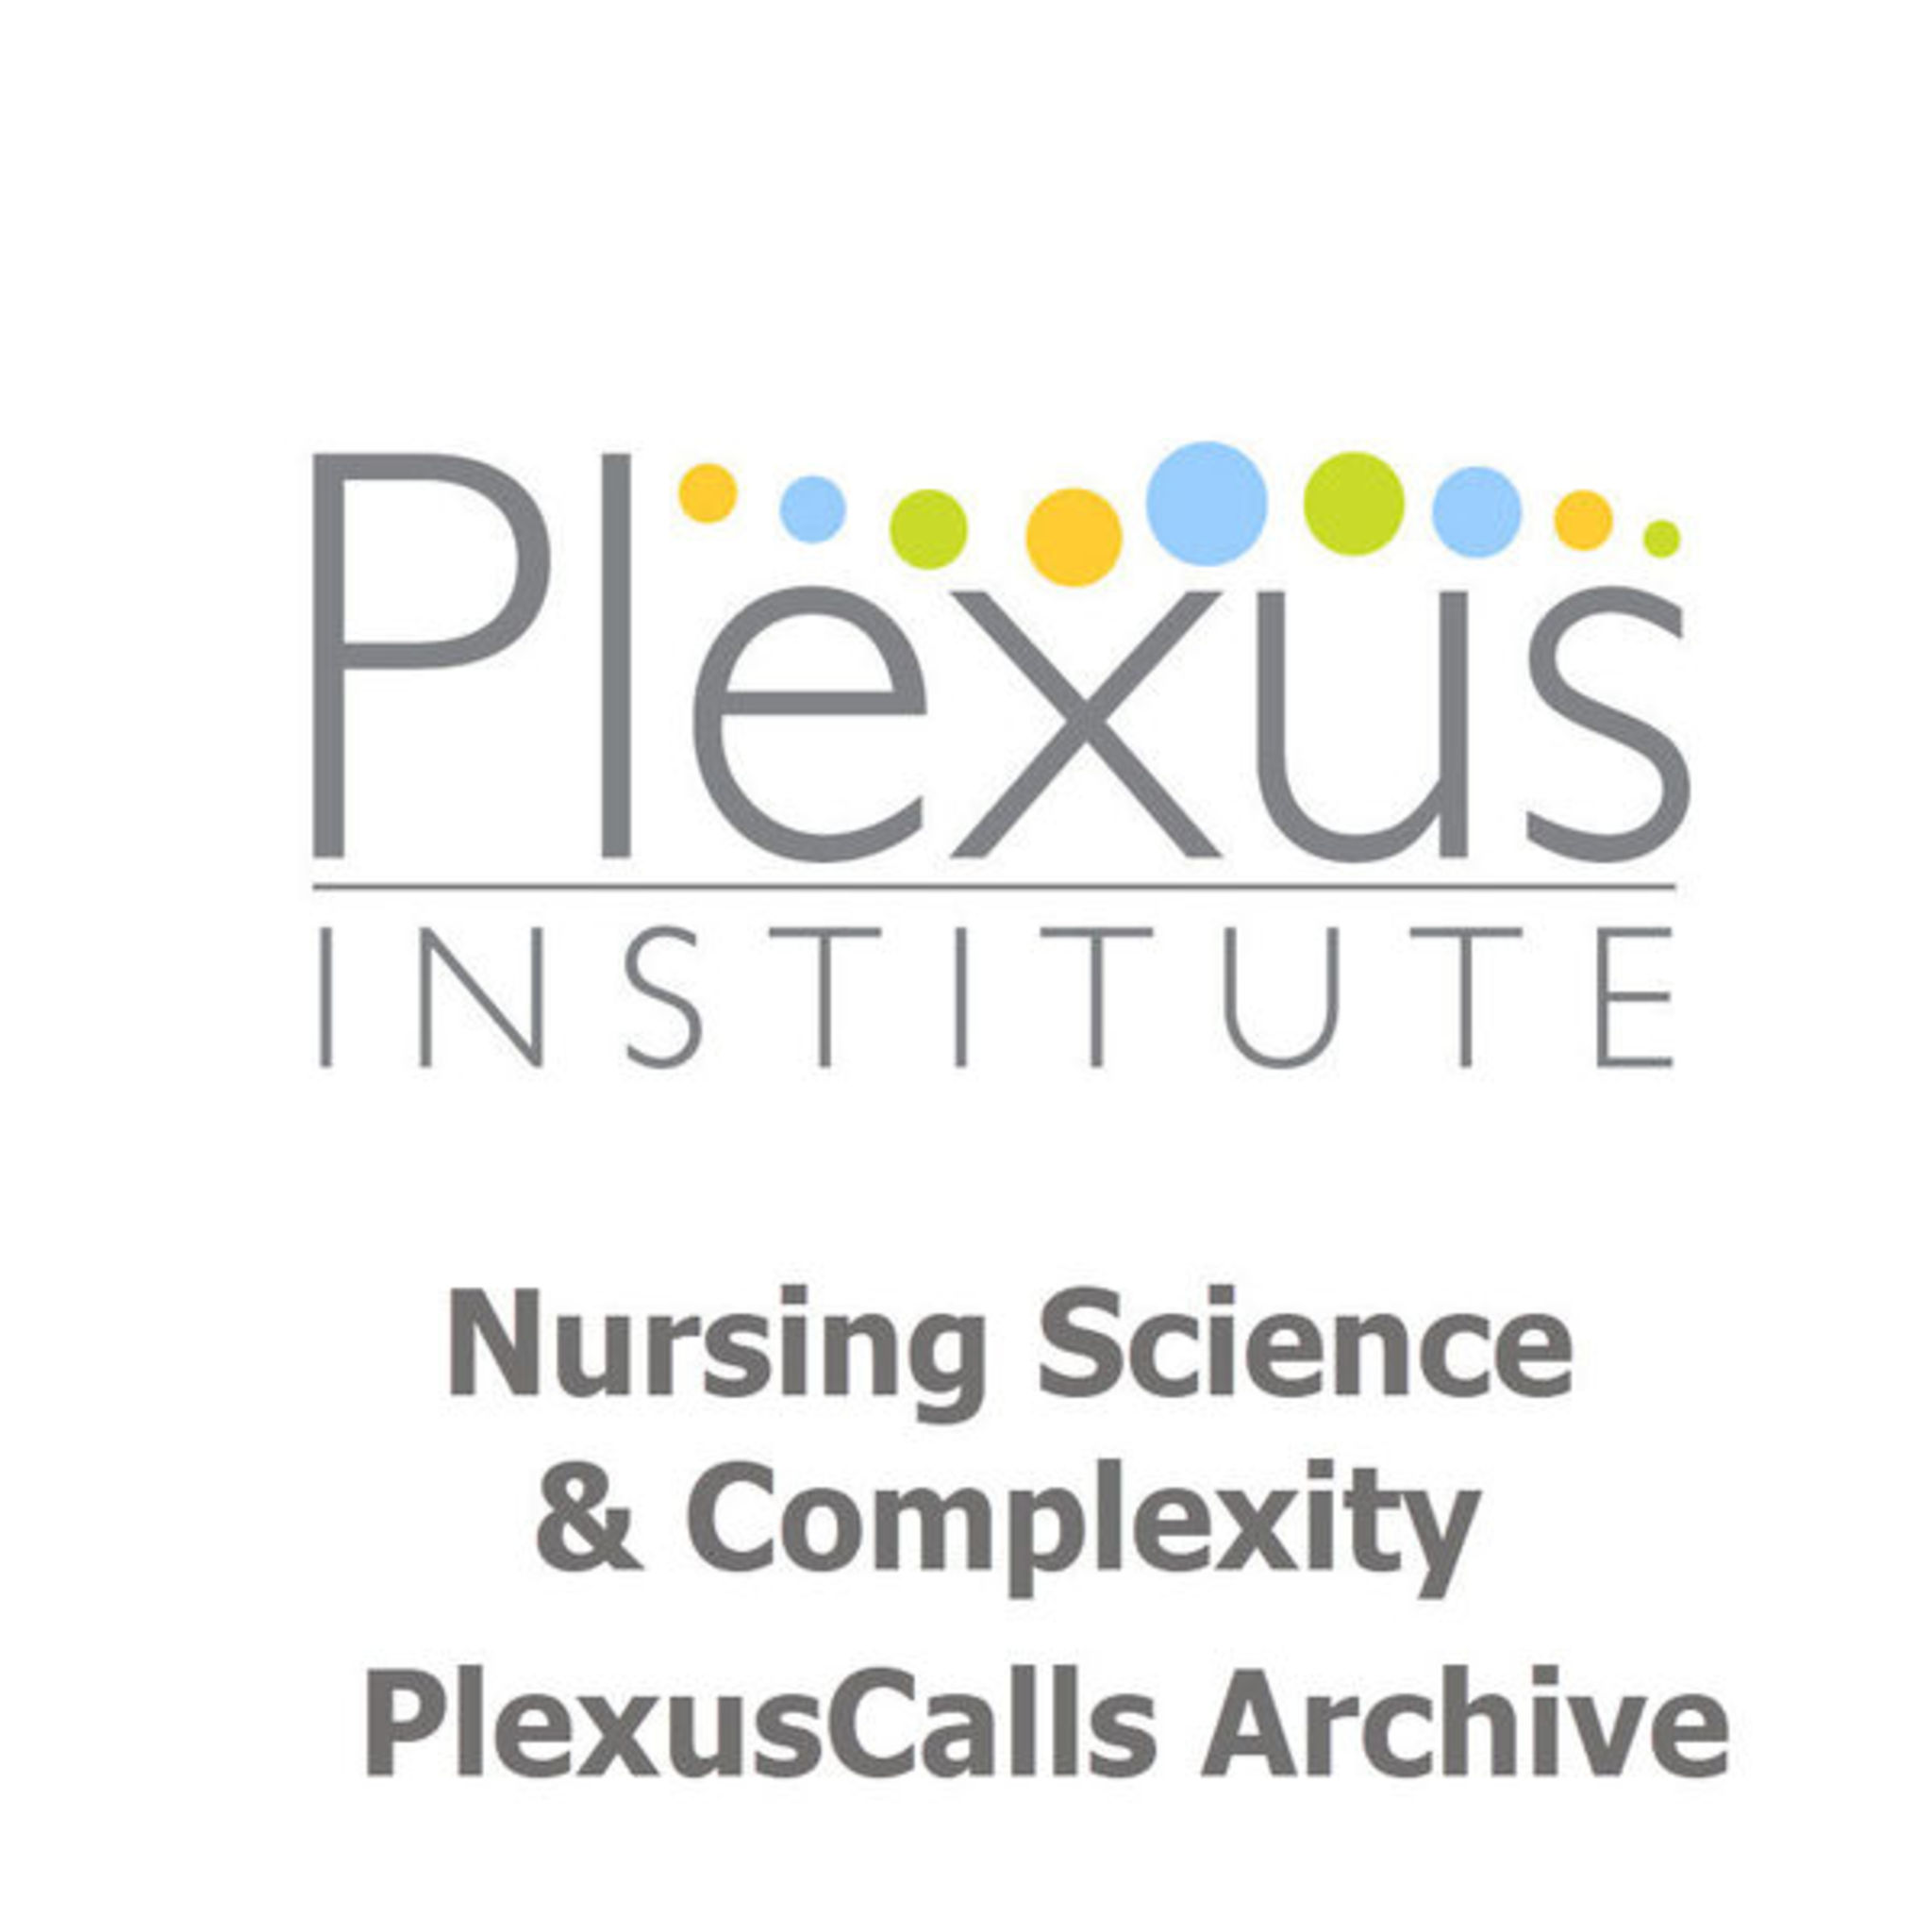 PlexusCalls Nursing Network